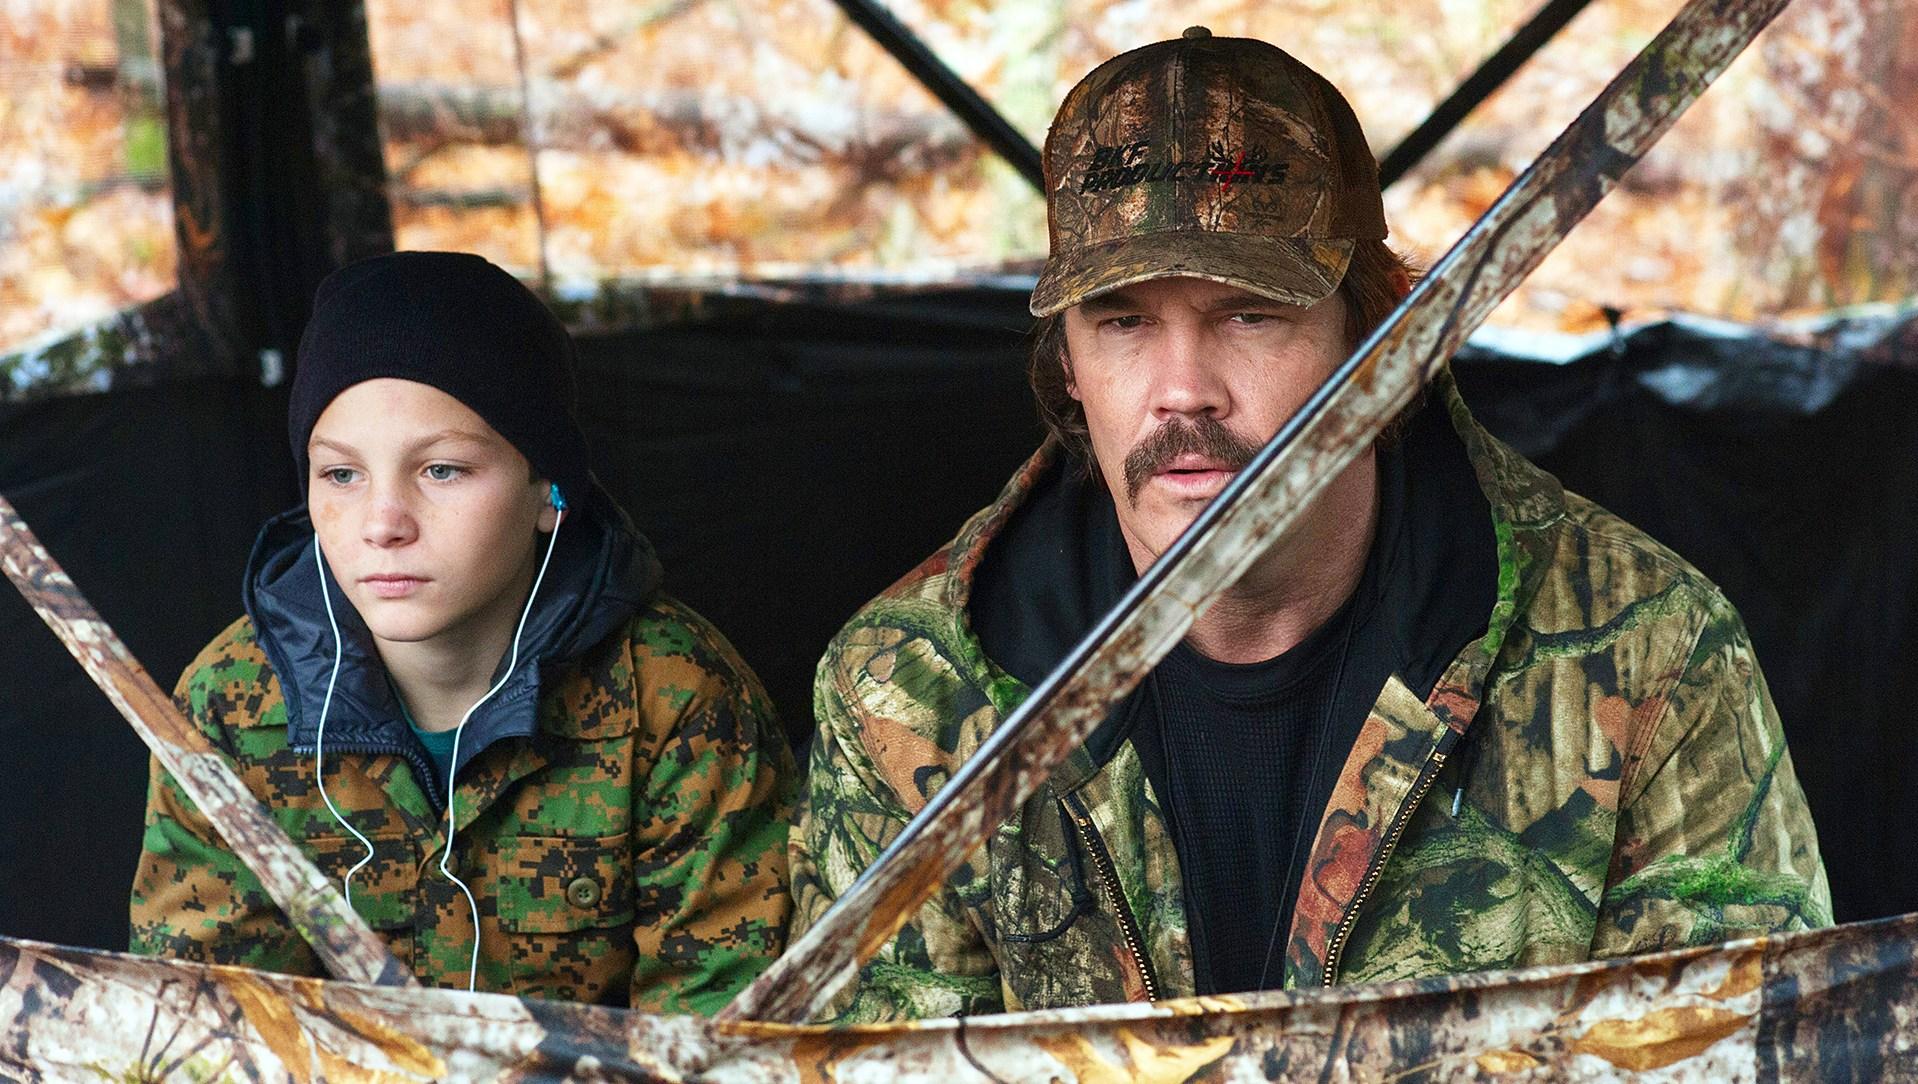 Montana Jordan Josh Brolin The Legacy of a Whitetail Deer Hunter